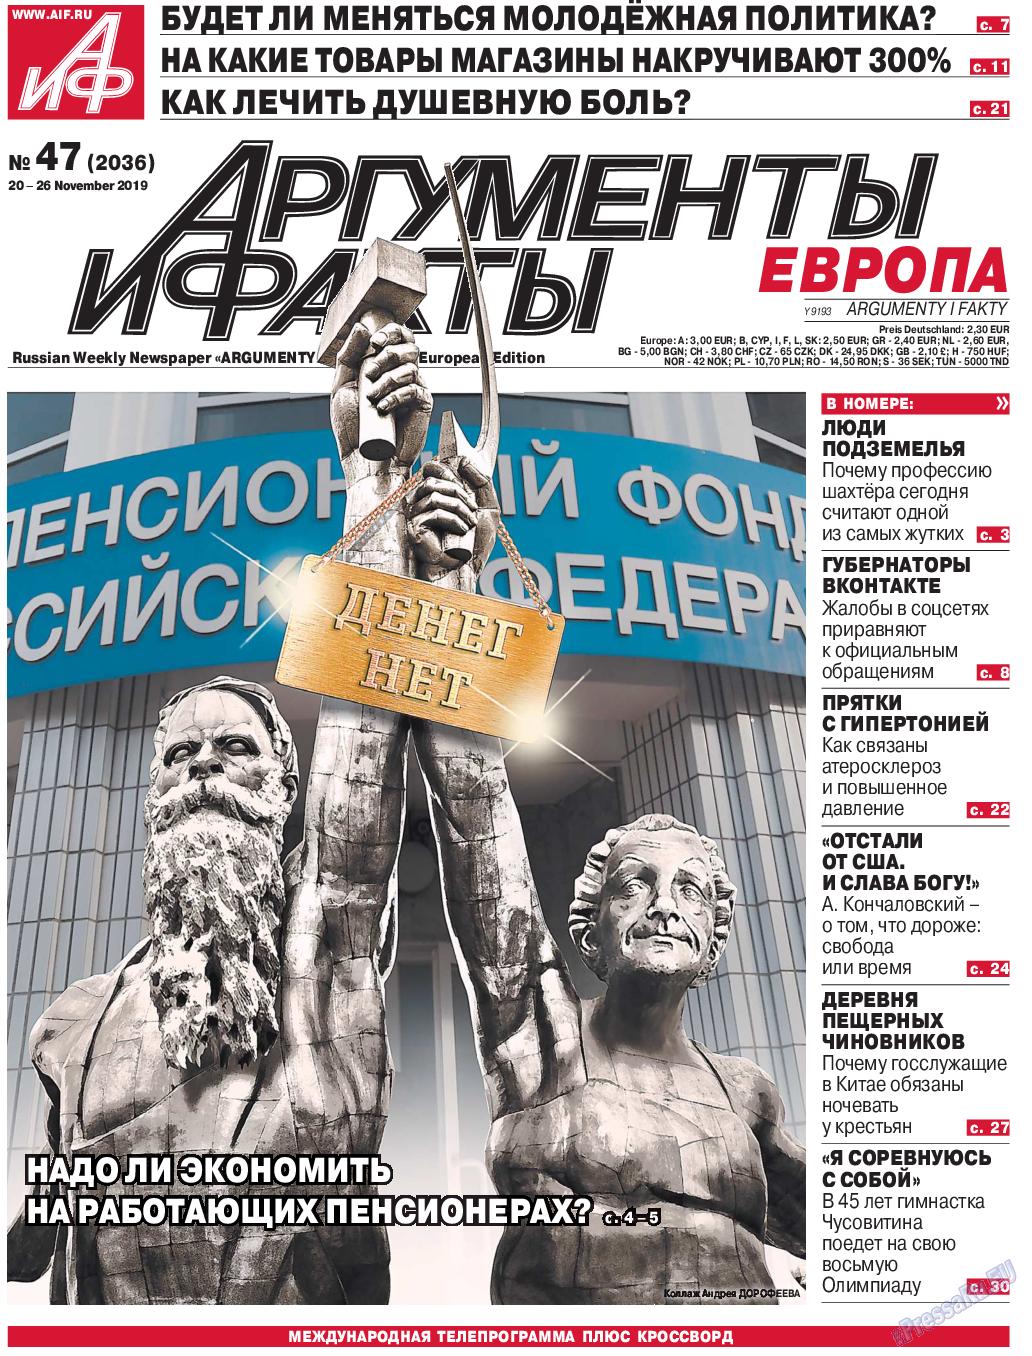 Аргументы и факты Европа (газета). 2019 год, номер 47, стр. 1